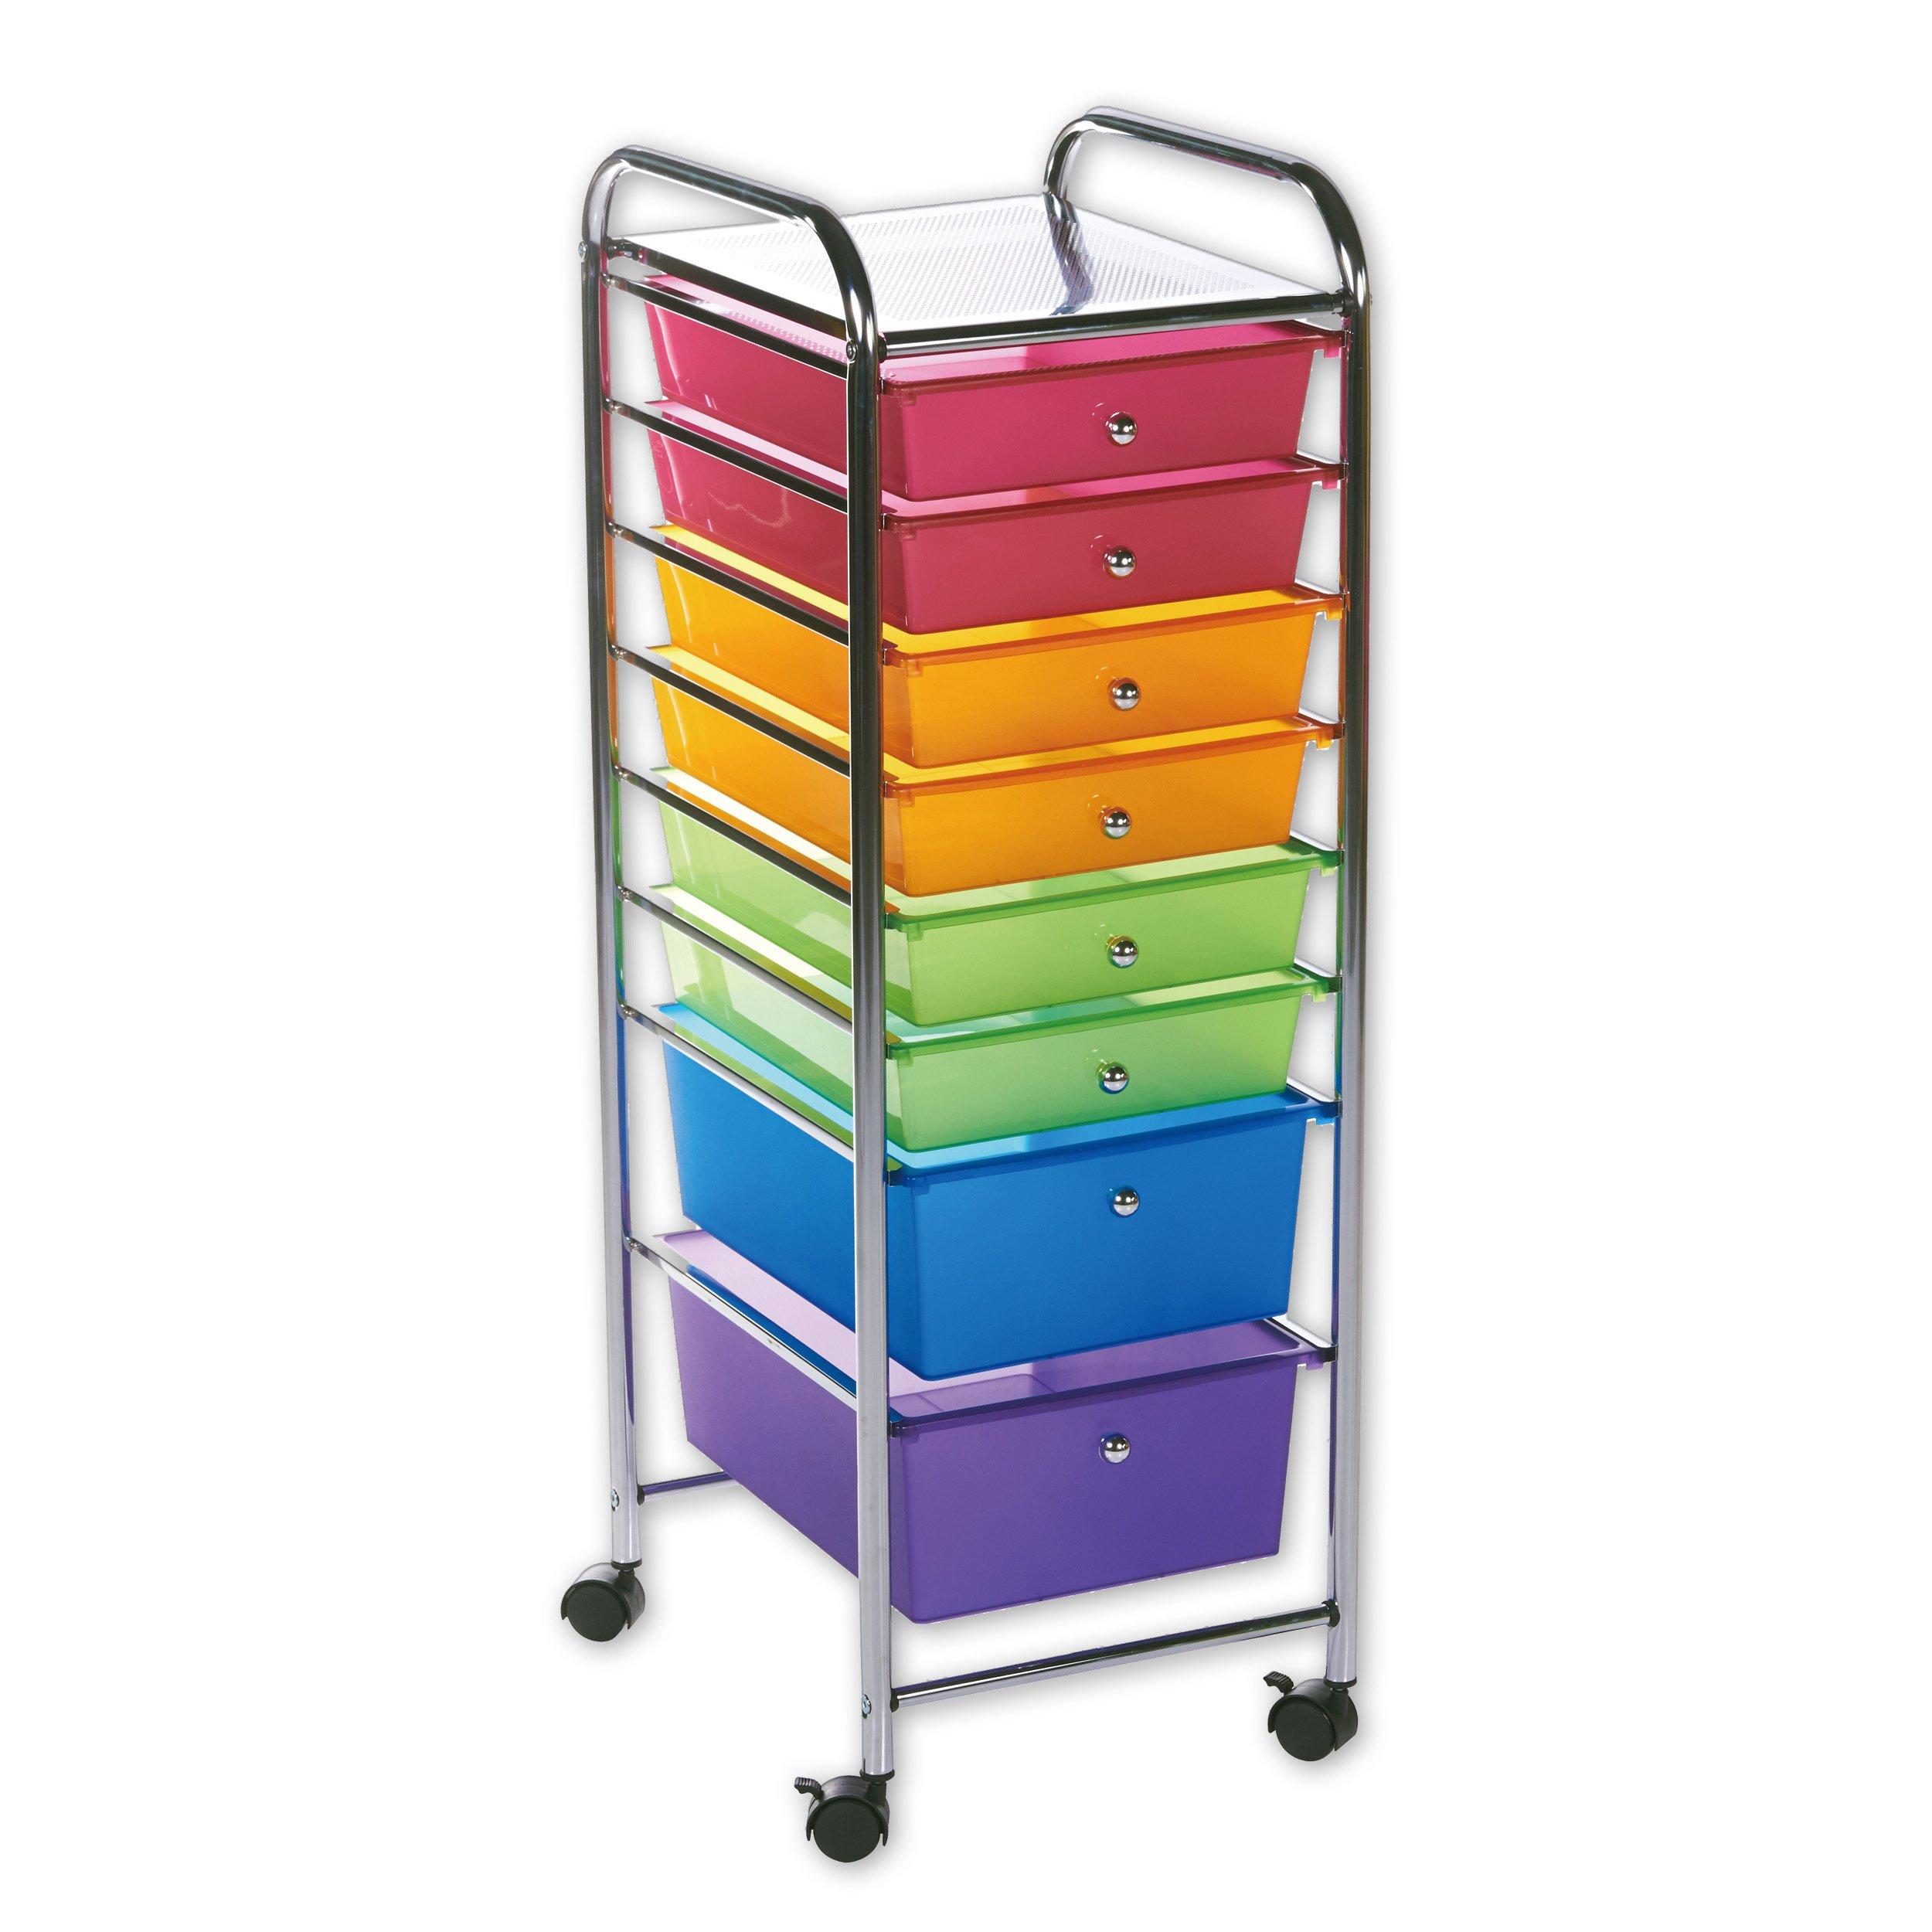 Rod Desyne 8 Drawer Rolling Storage Cart, Satin Nickel by Rod Desyne